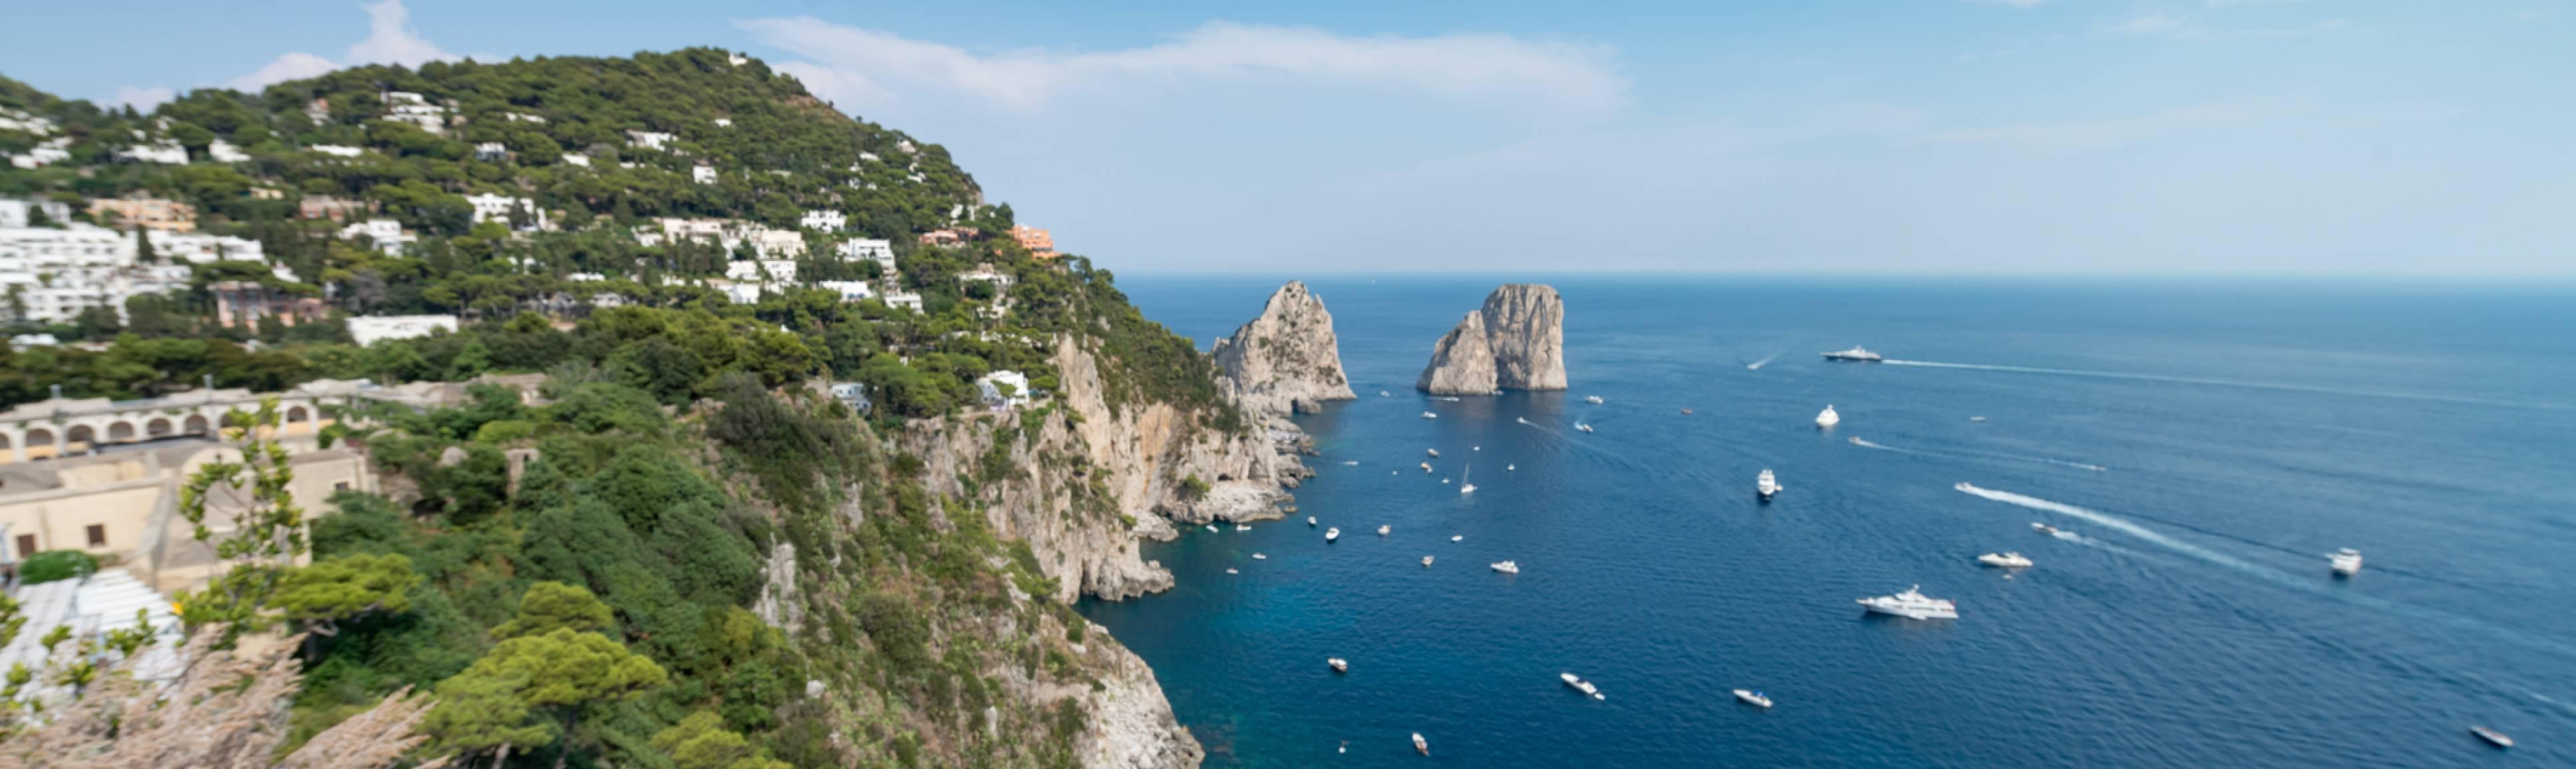 Looking down at the Tyrrhenian Sea along the Amalfi Coast, Italy